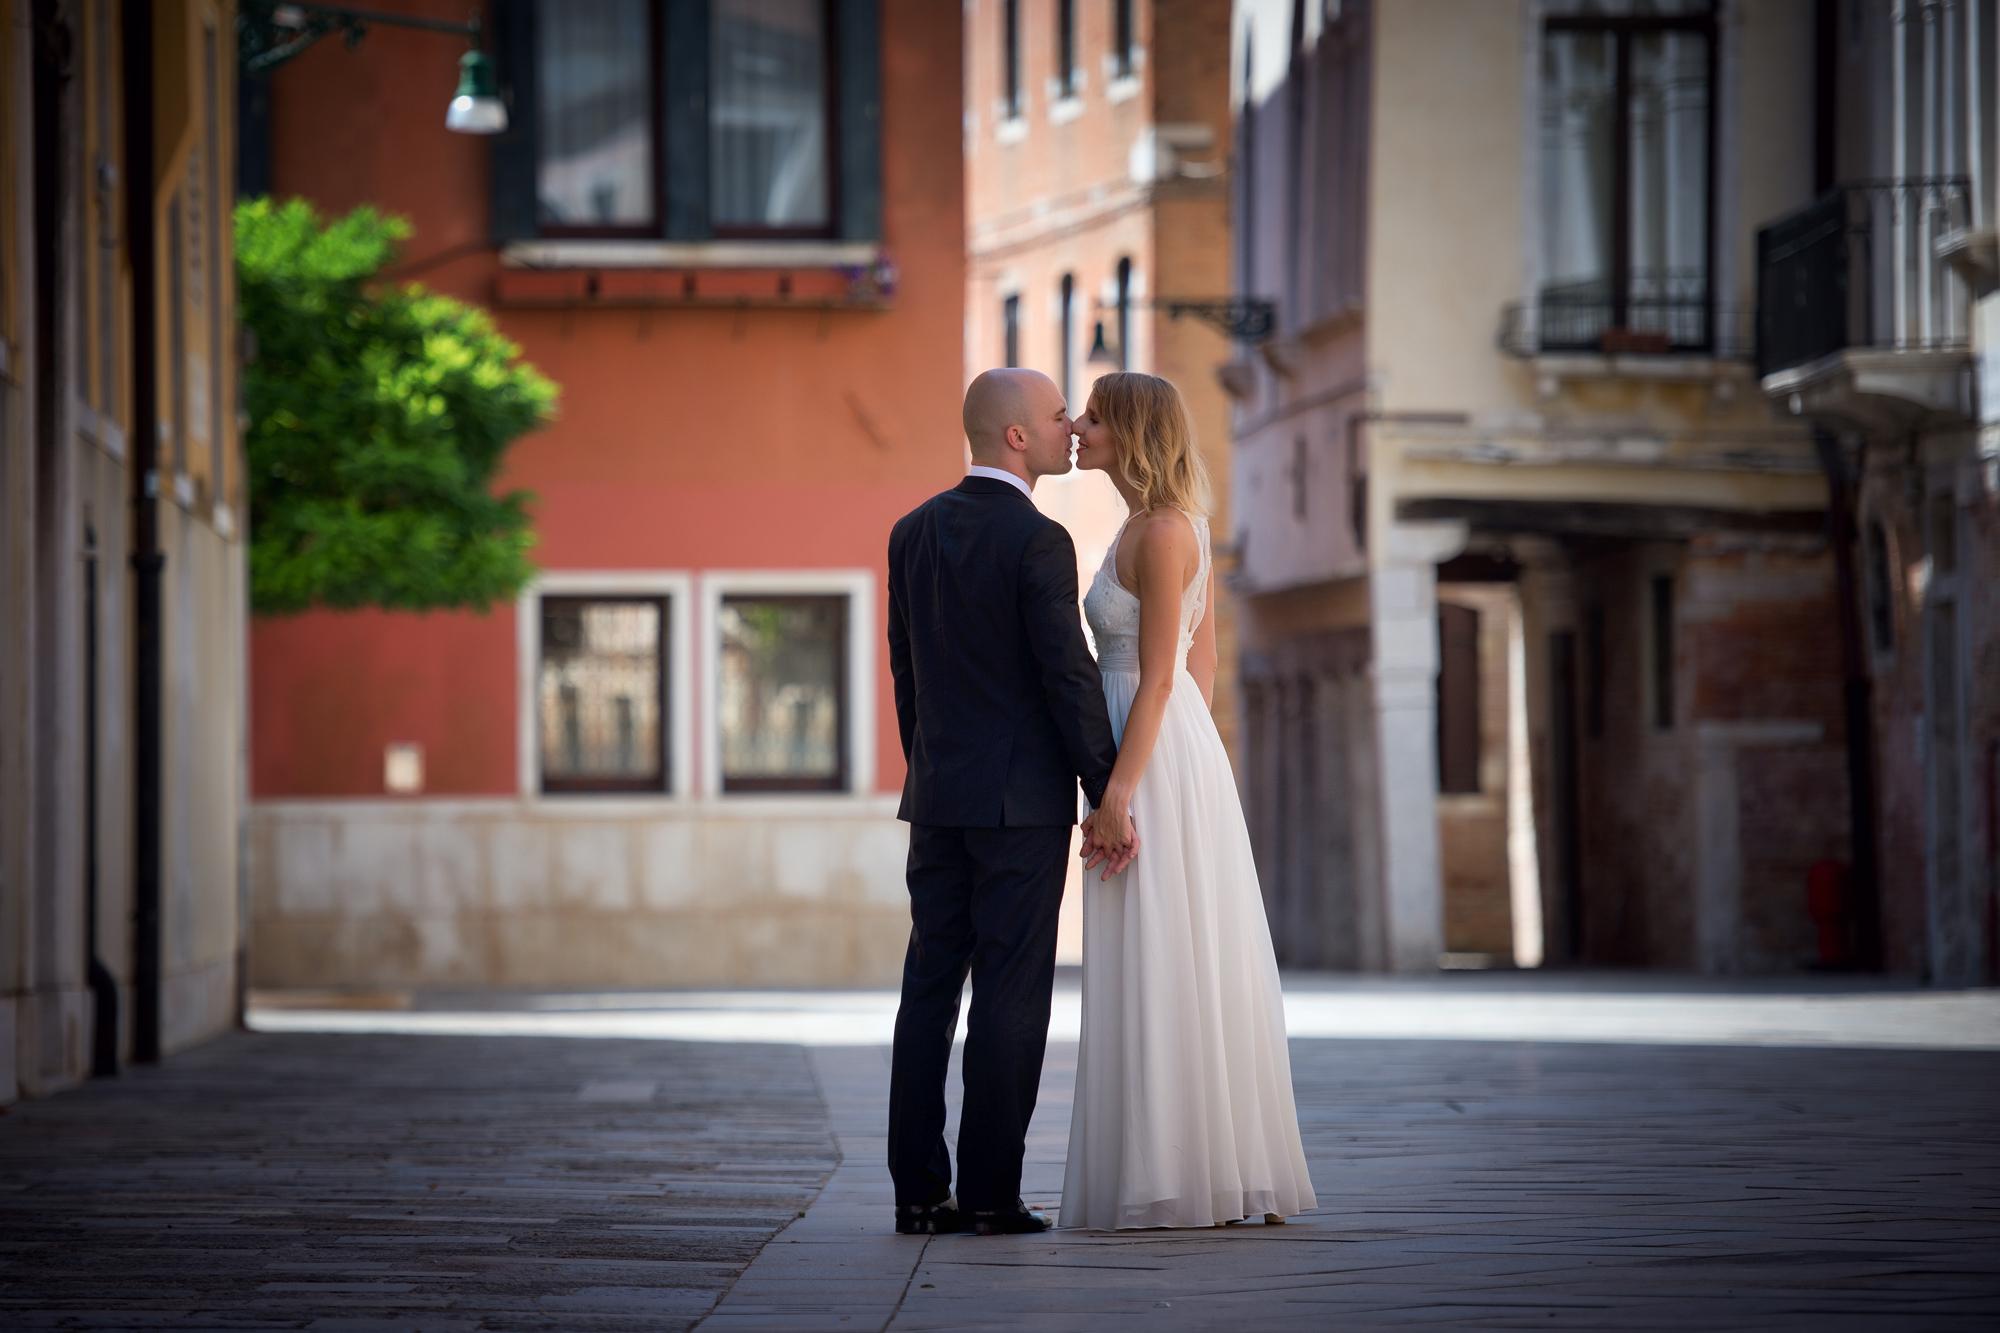 Mariage Venise Photographe laure jacquemin mairie service photographique salute san giorggiomaggiore